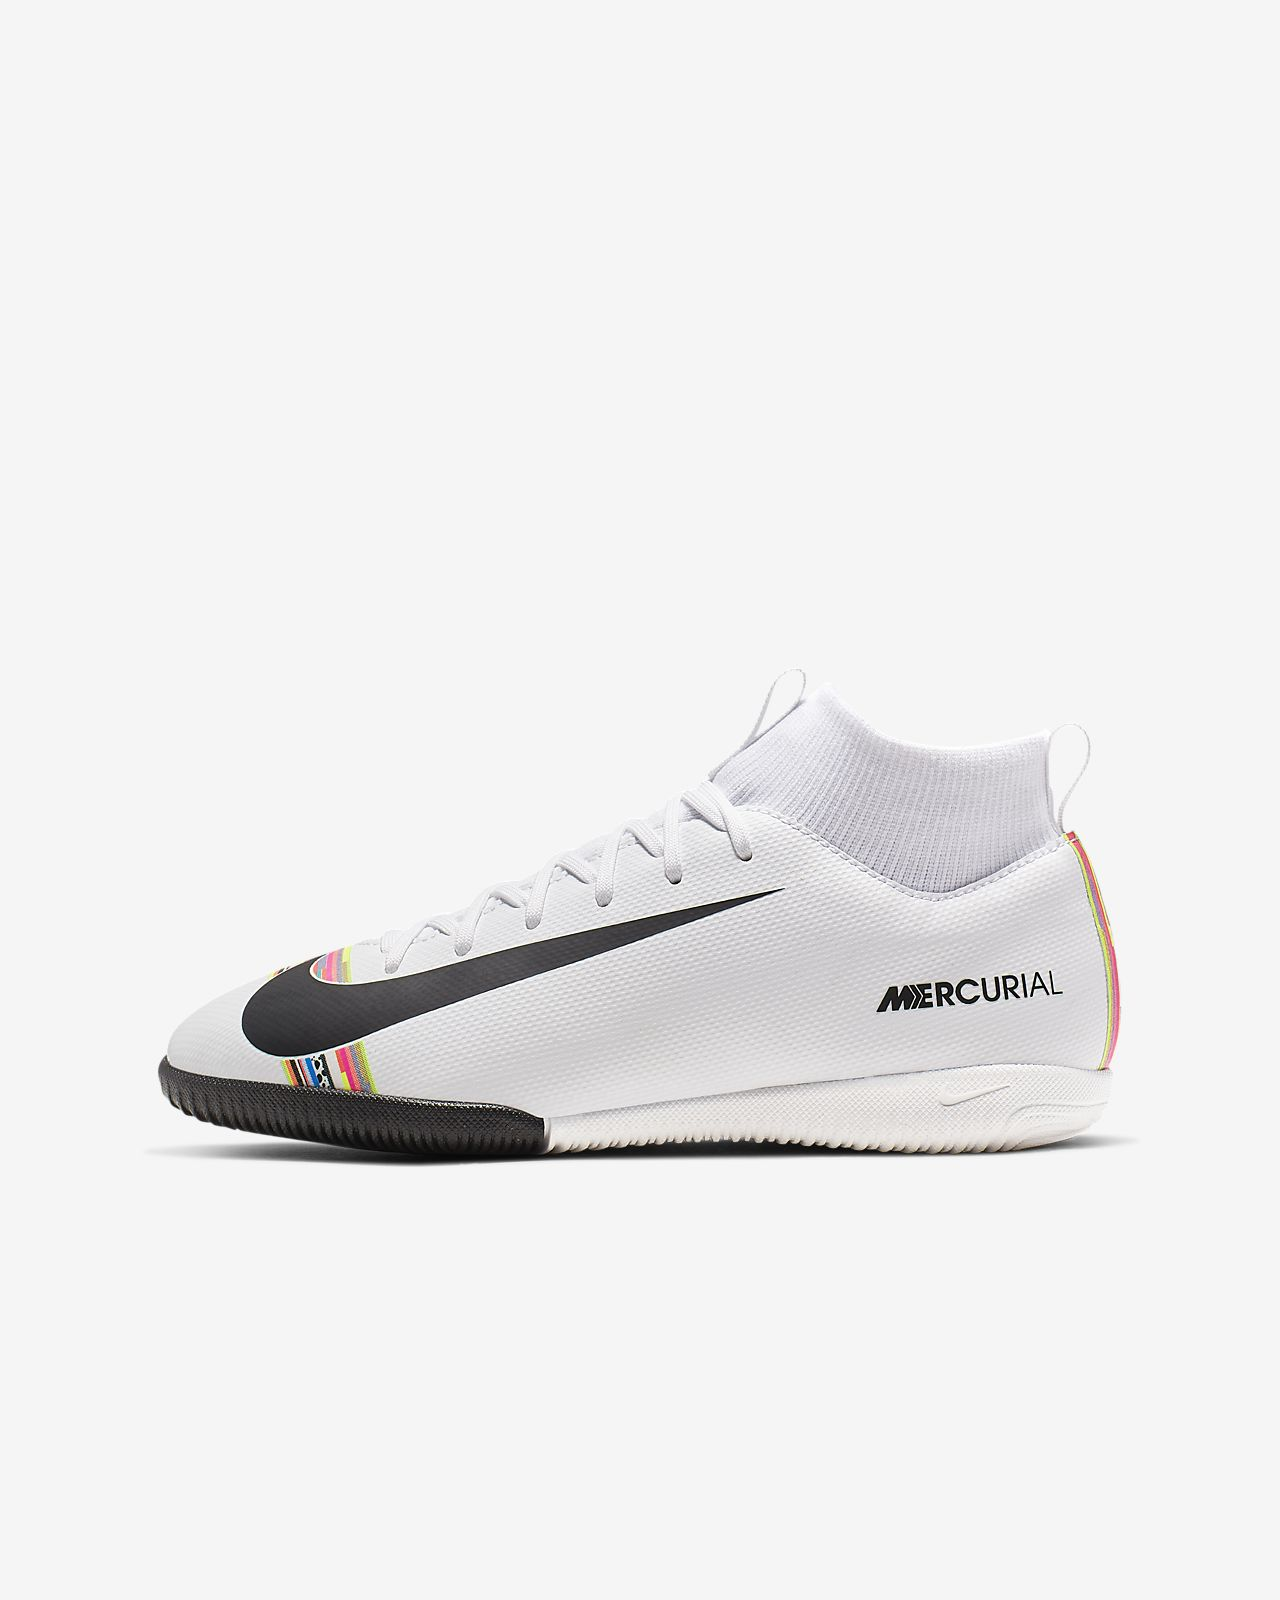 Nike Jr. SuperflyX 6 Academy LVL UP IC Küçük/Genç Çocuk Kapalı Saha/Salon Kramponu